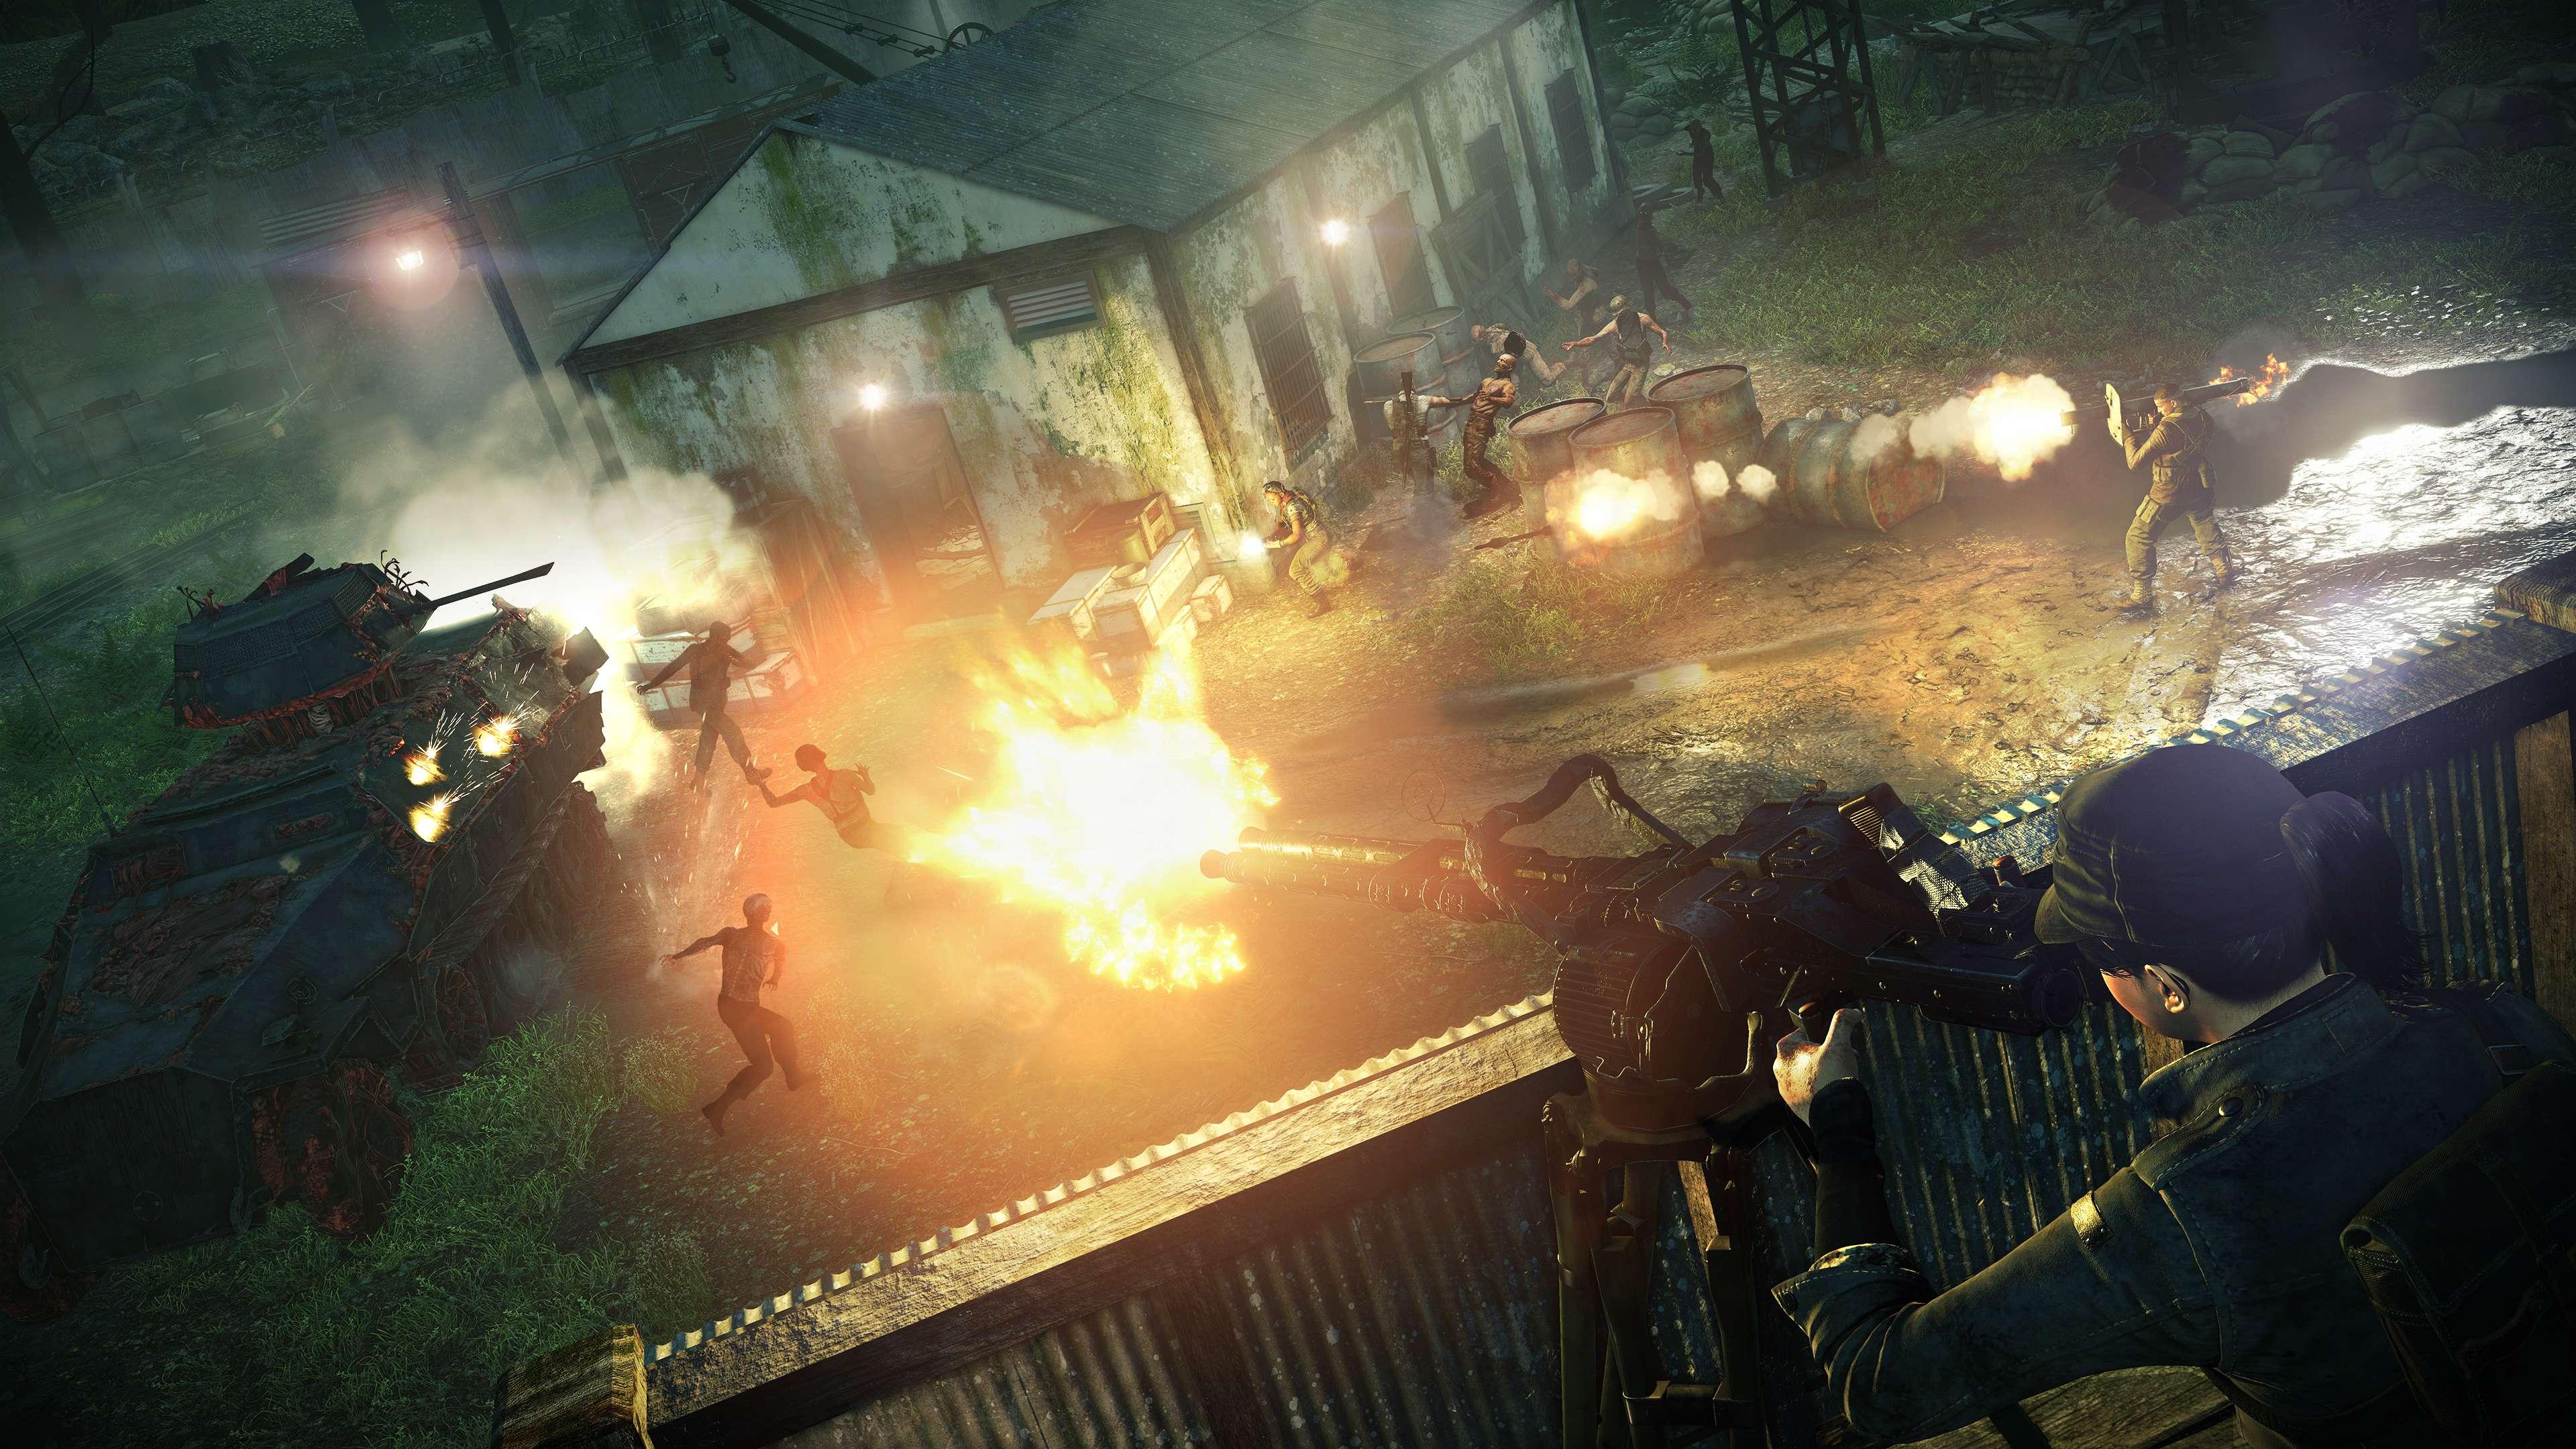 PS4 / XB1《僵尸部队4:死亡战争》本日发售正式解放第一季追加内容